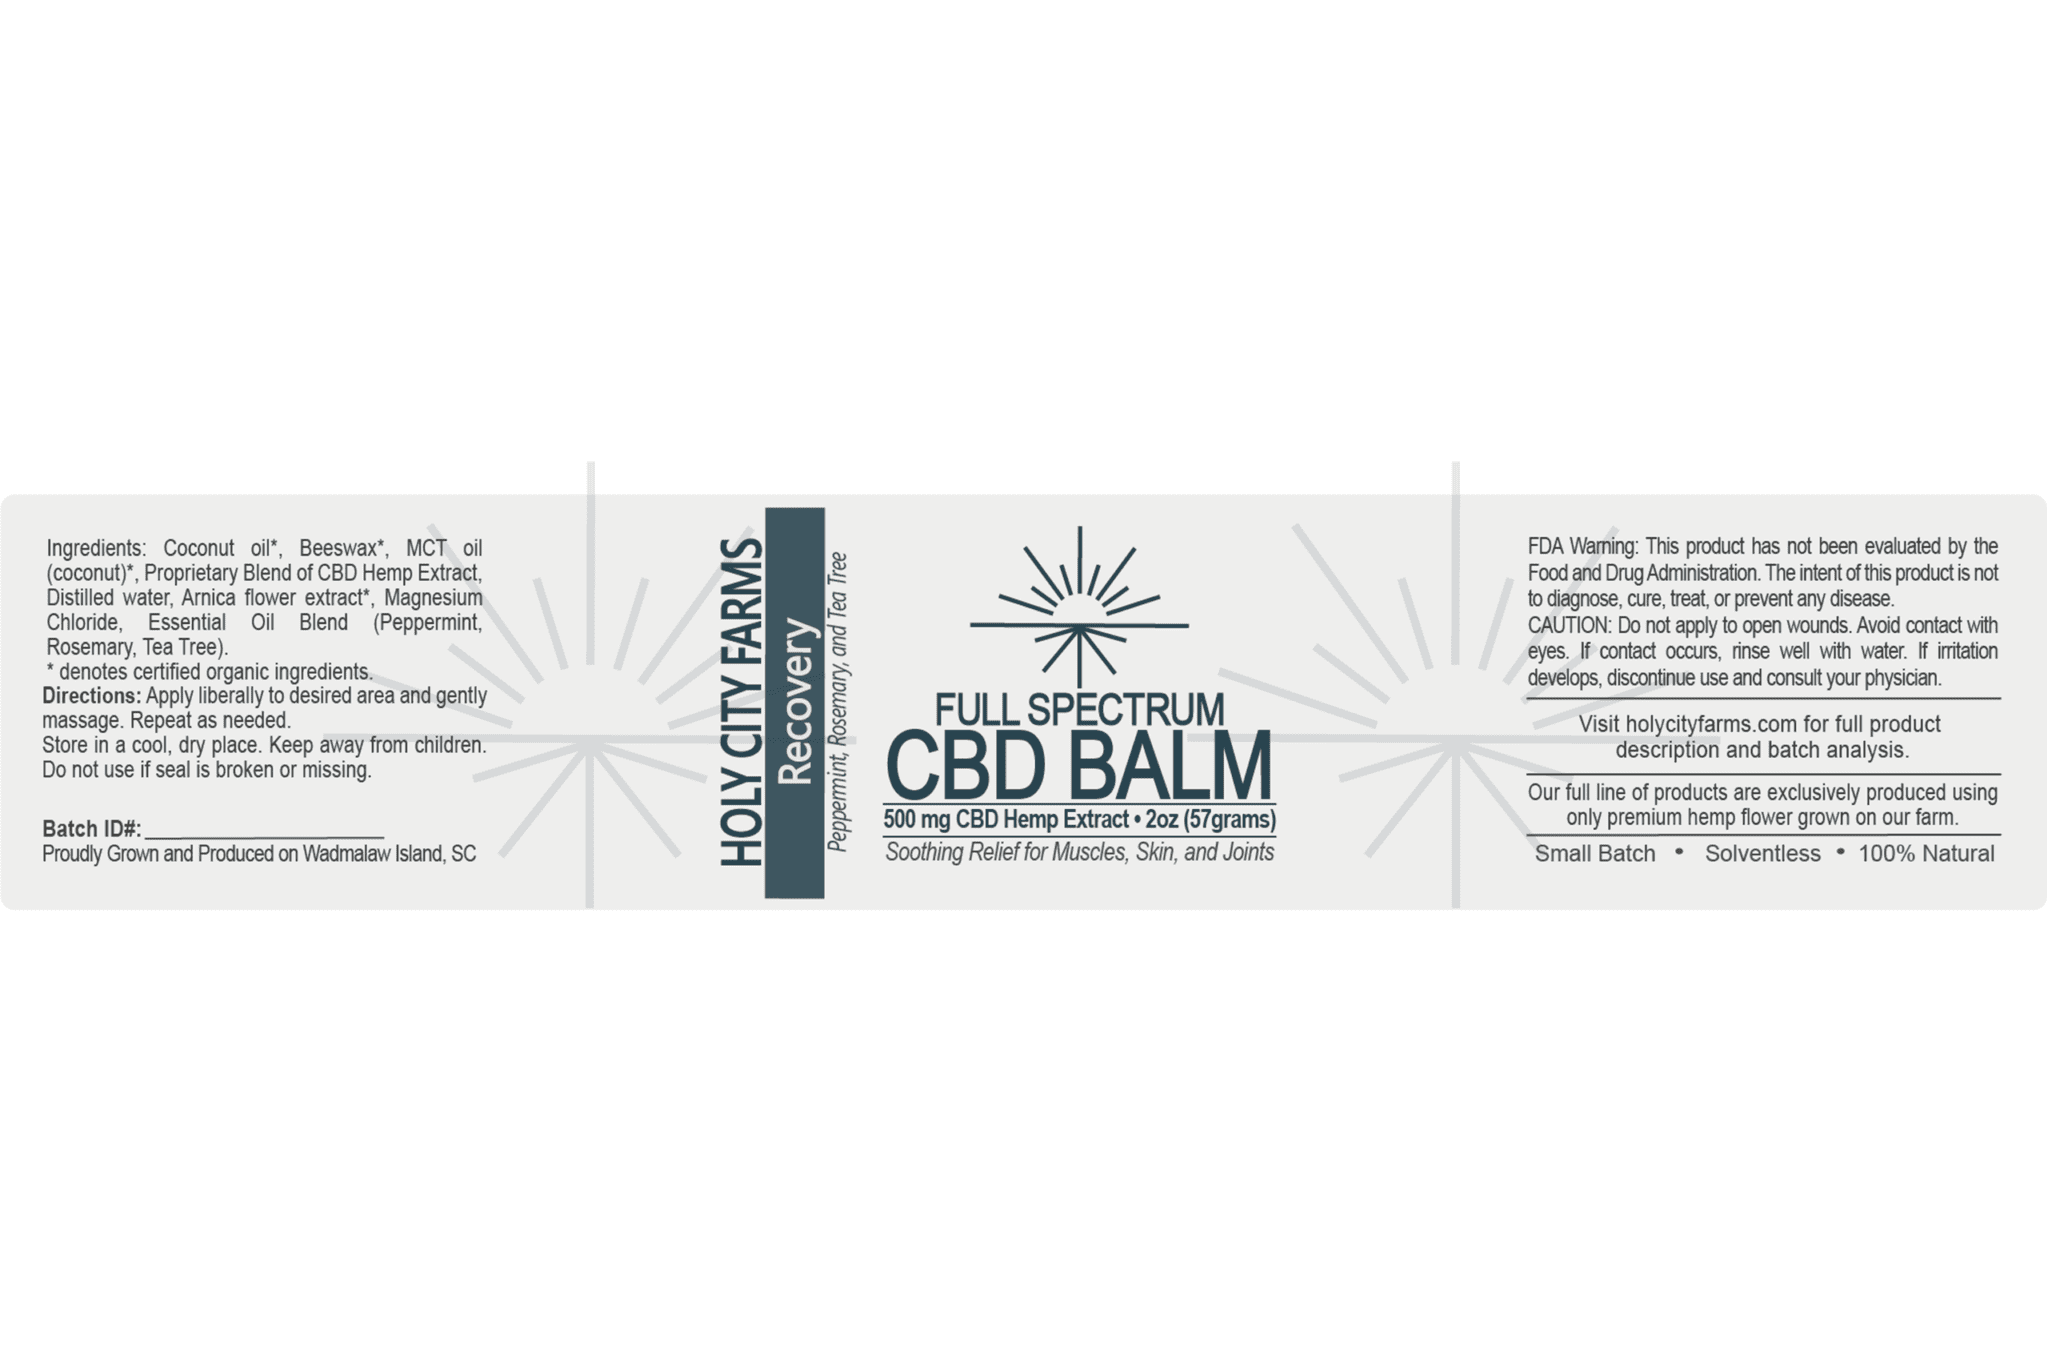 Label for Full Spectrum CBD Balm - Recovery